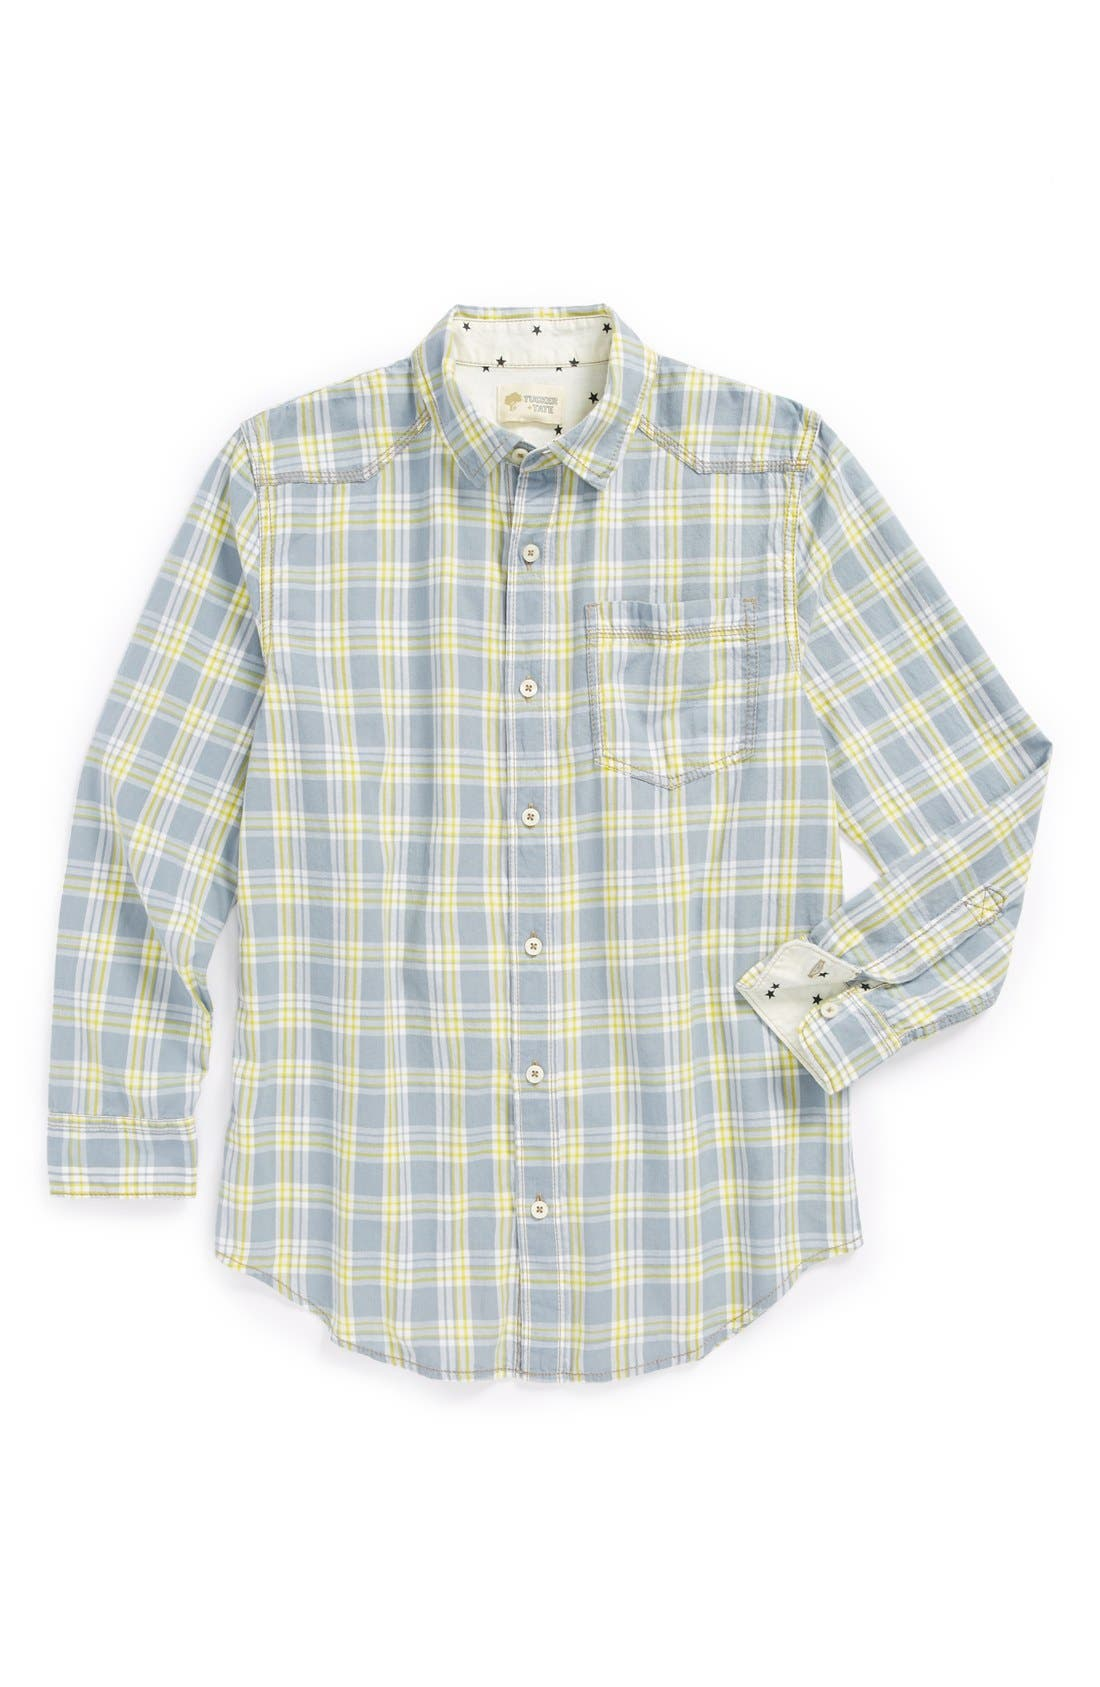 Alternate Image 1 Selected - Tucker + Tate 'Conrad' Plaid Shirt (Big Boys)